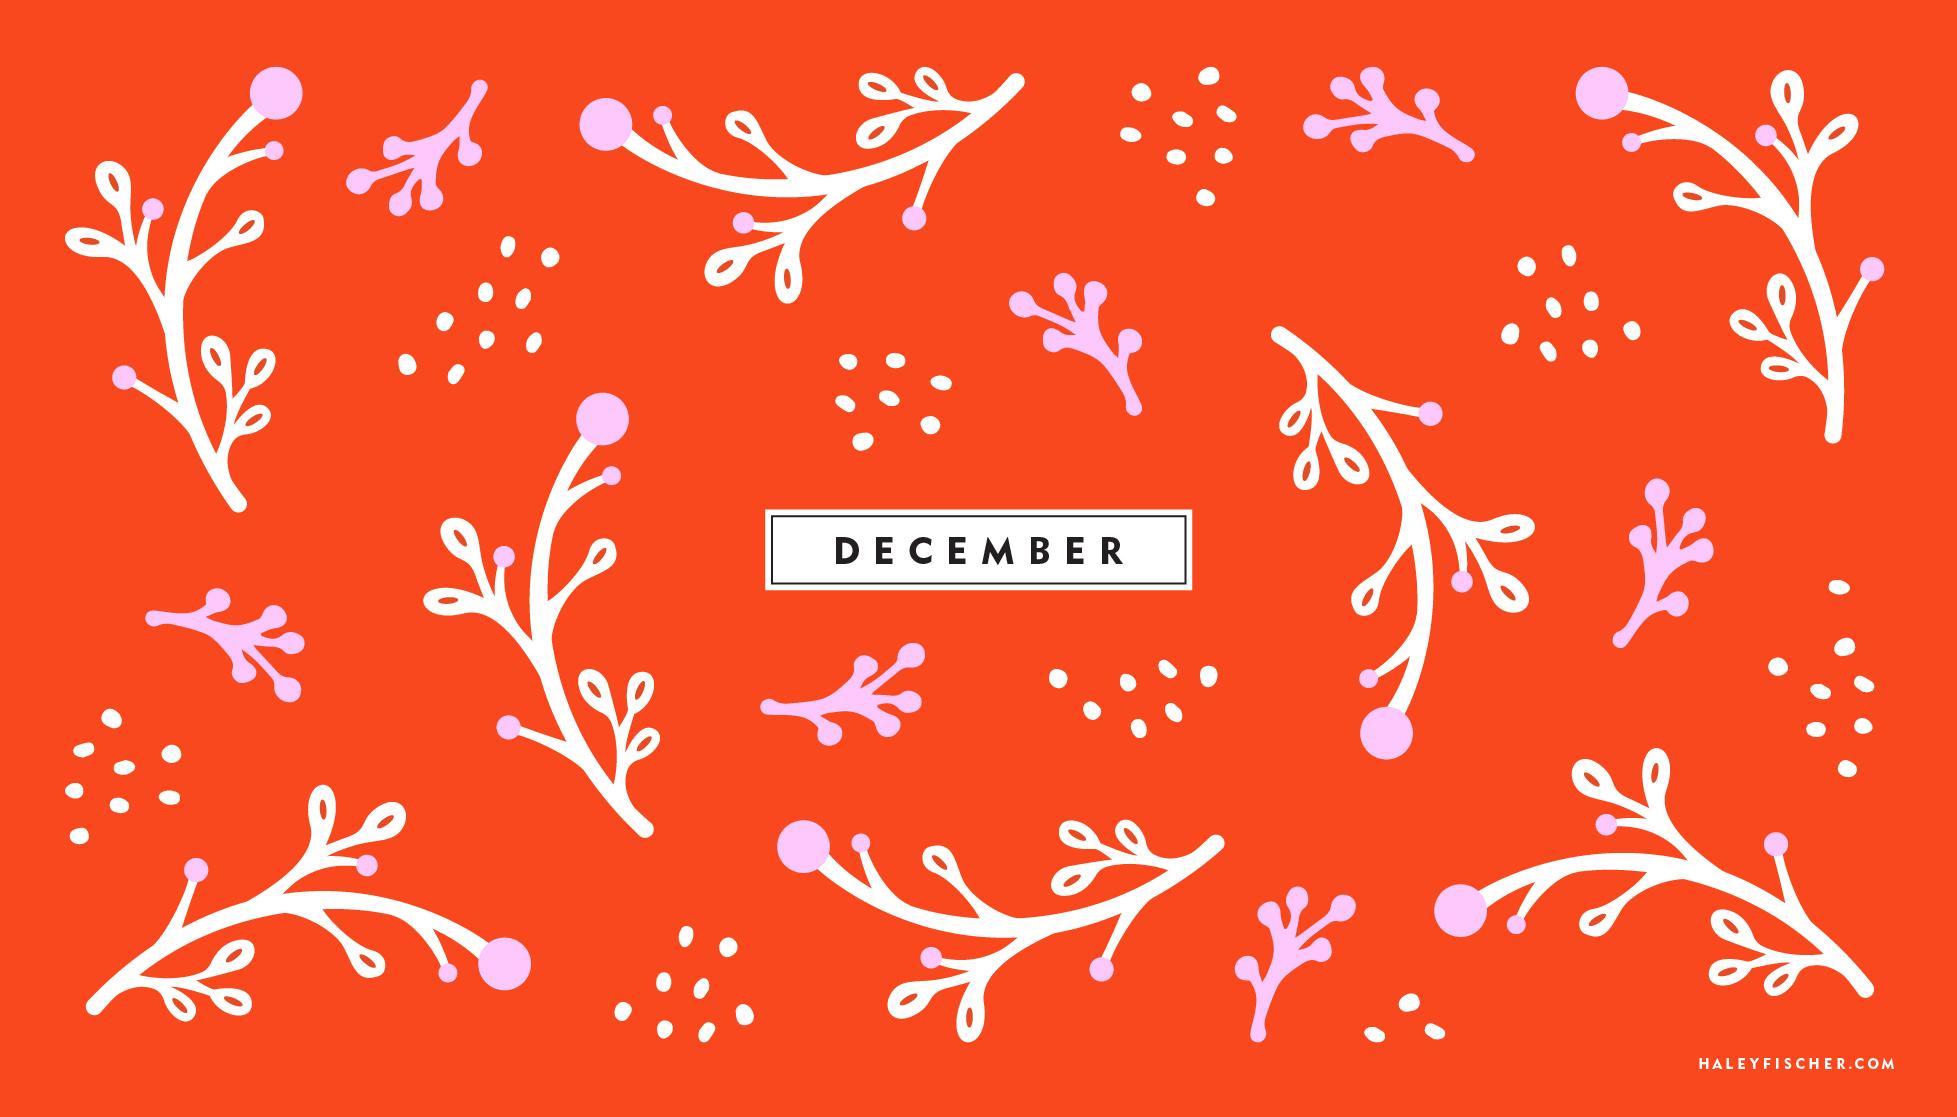 Download December Wallpaper Here